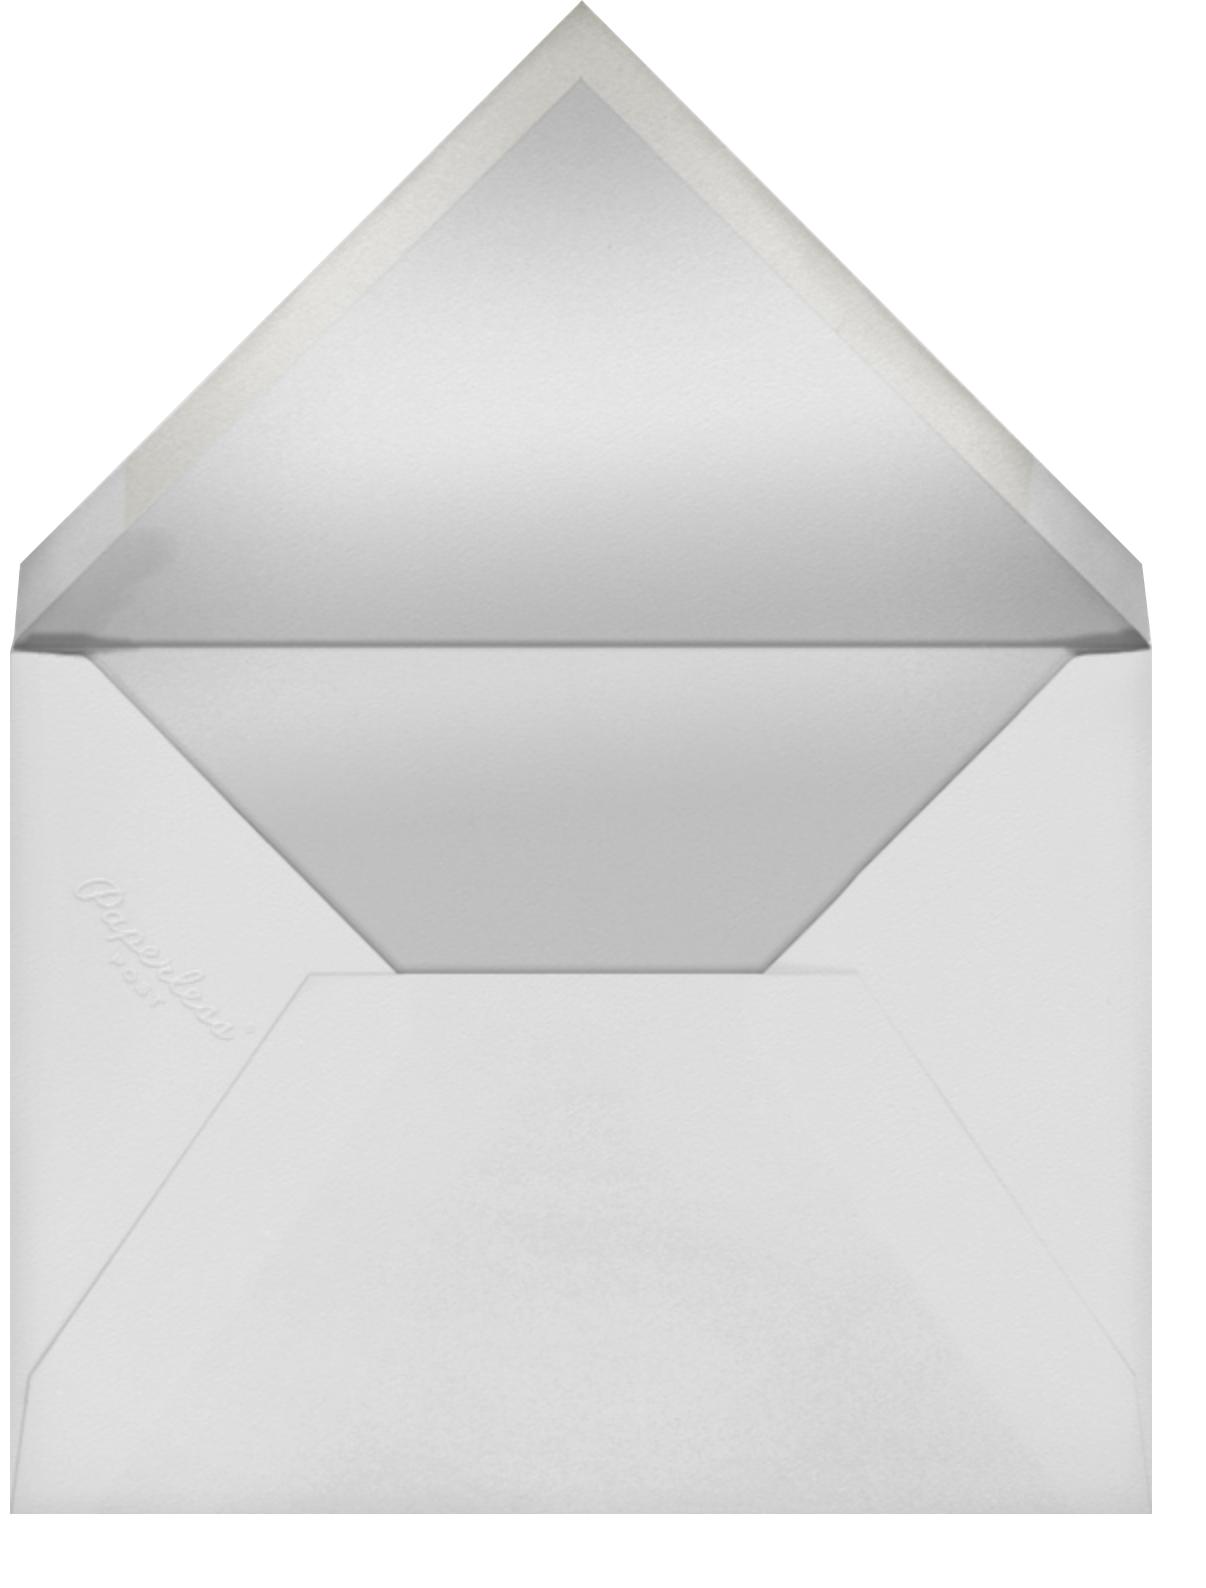 Gardenia (Menu) - Oscar de la Renta - Menus - envelope back